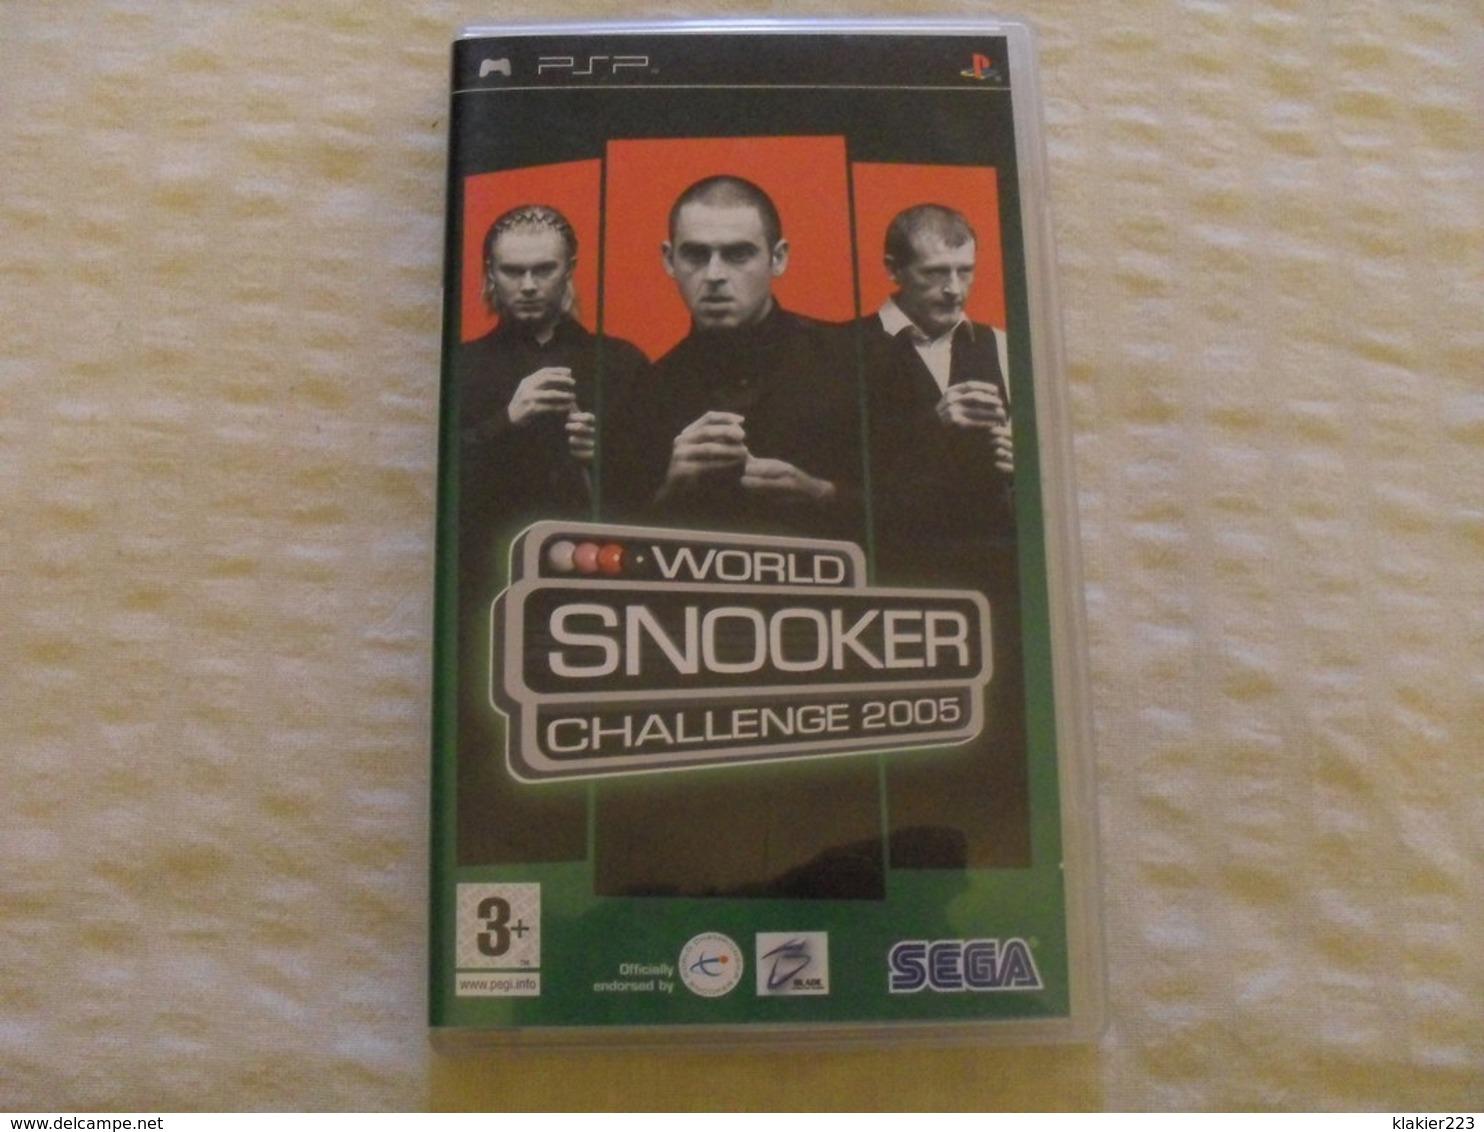 World Snooker Challenge 2005 / Sony PSP - Sony PlayStation